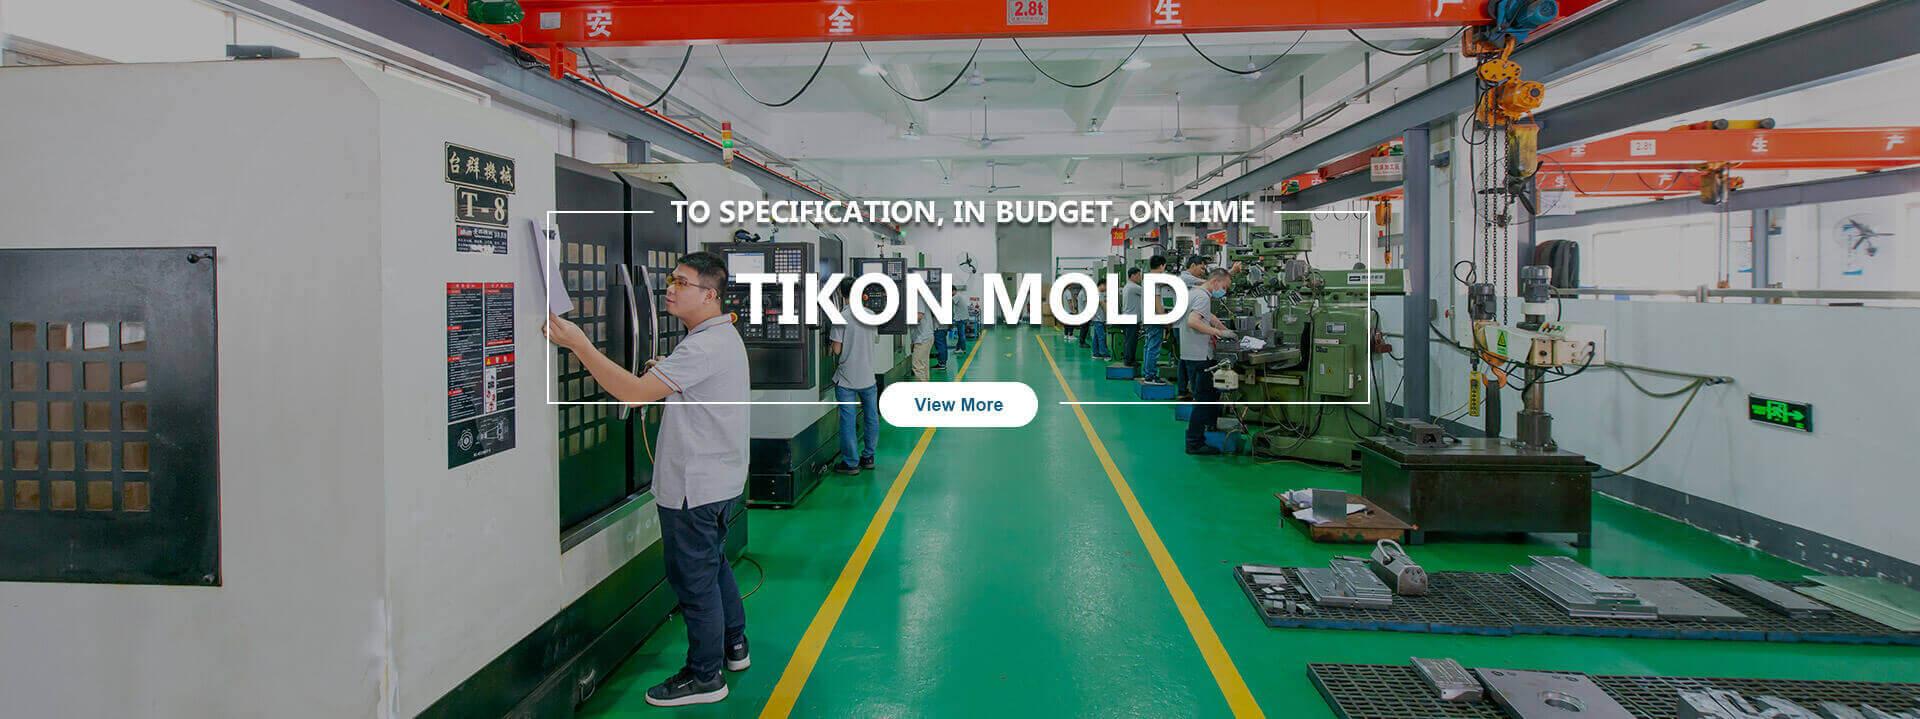 Tikon Mold Technology Factory